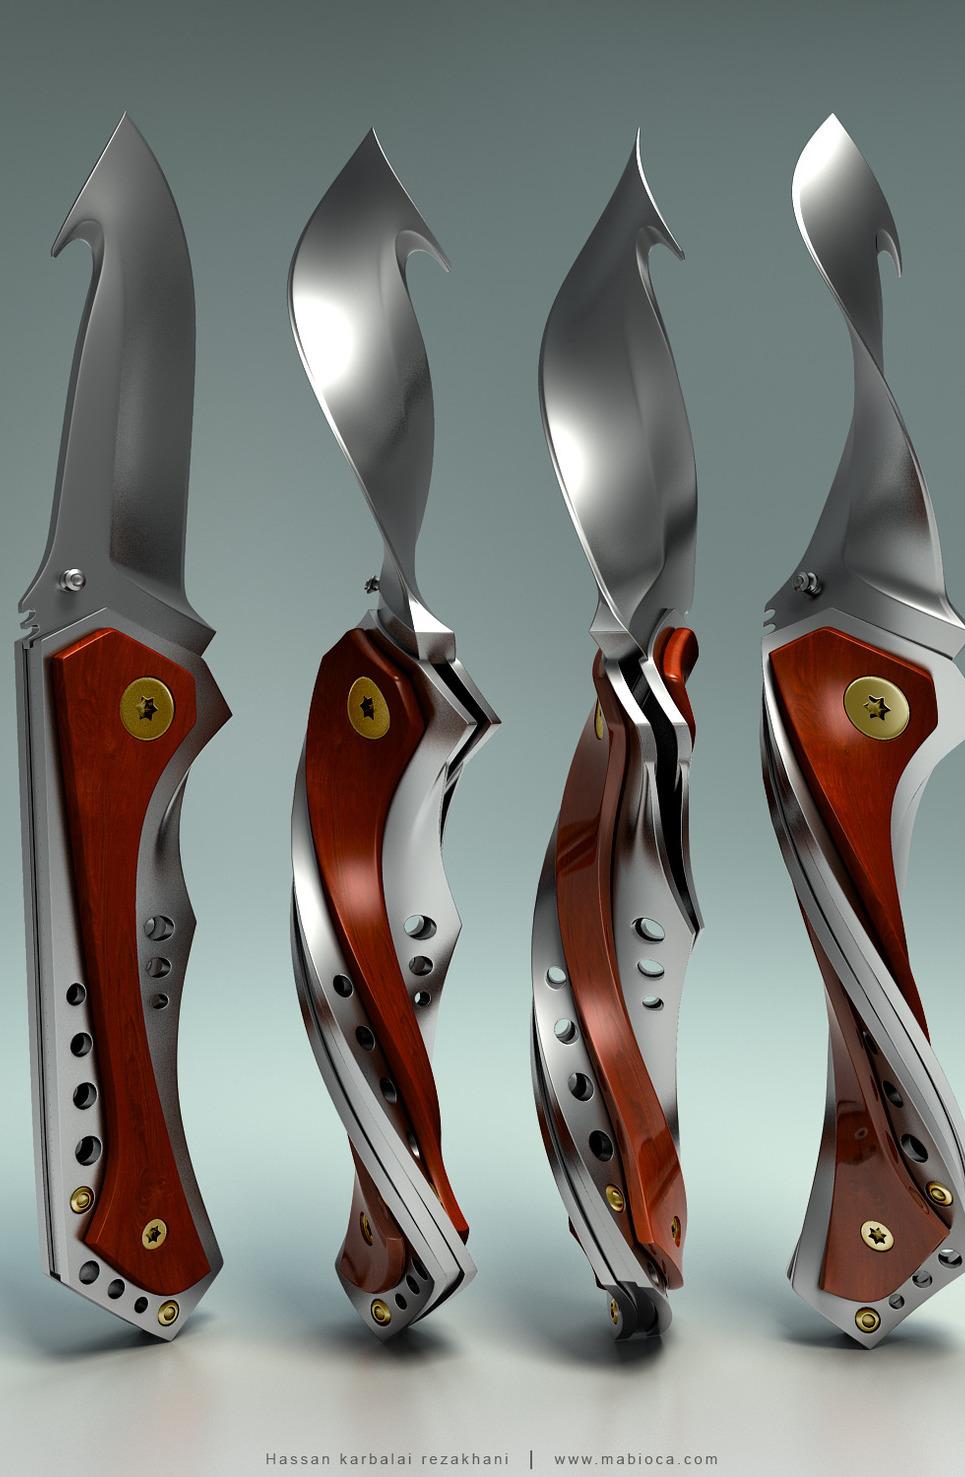 Knife92 show